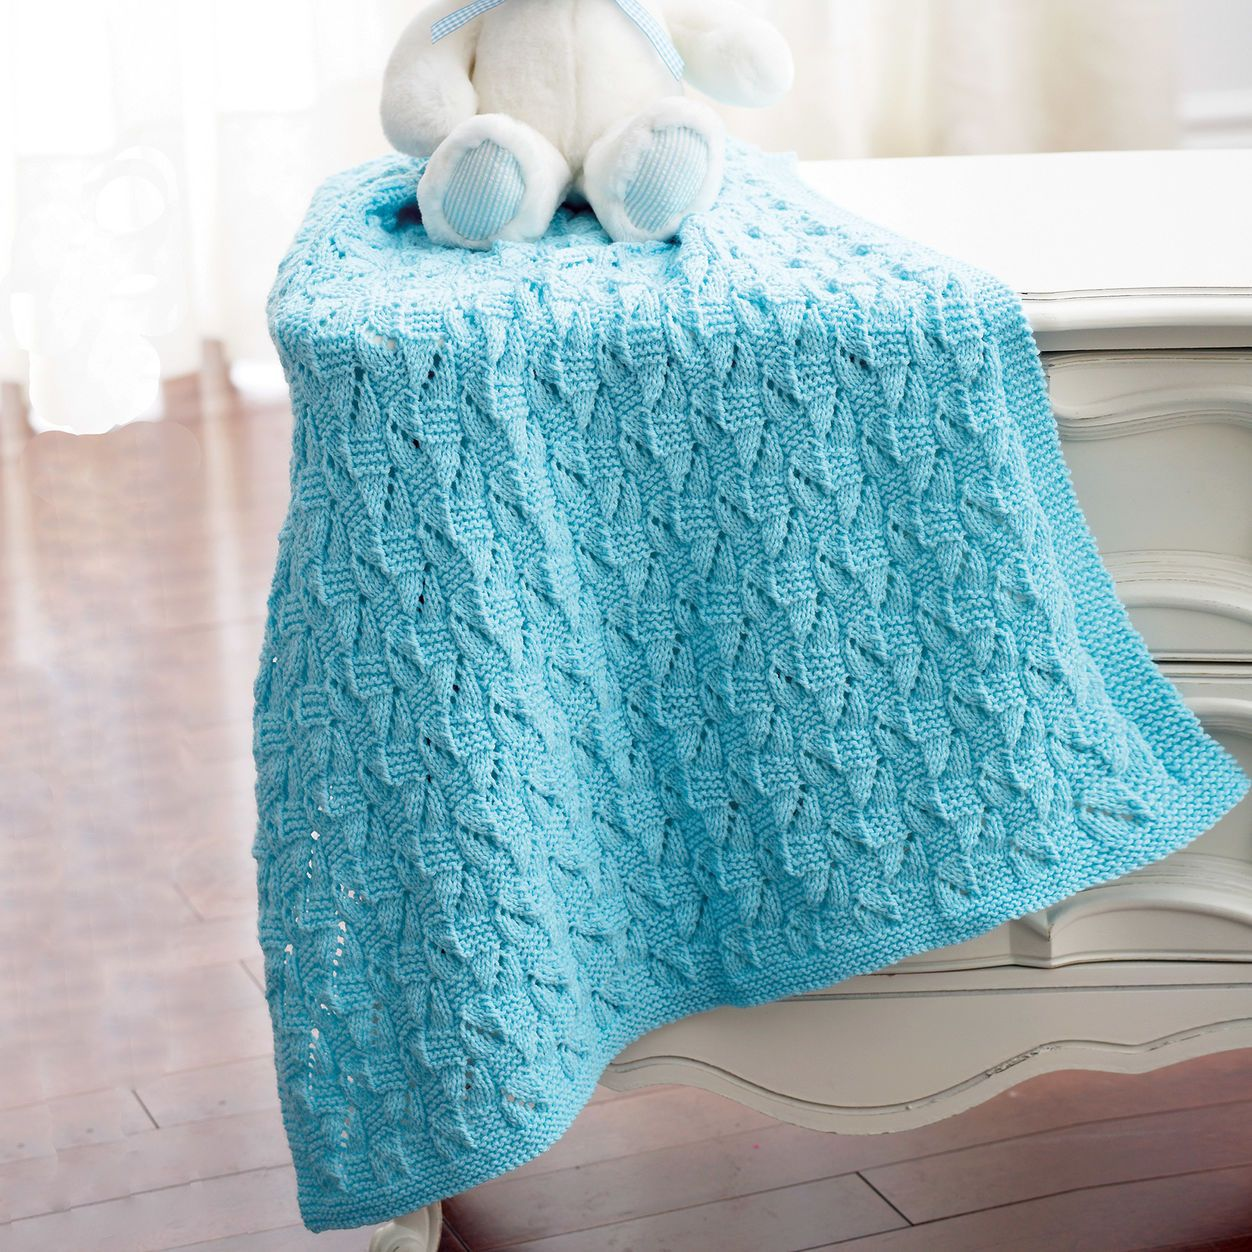 Bernat Staggered Squares Blanket. Interesting stitch ...